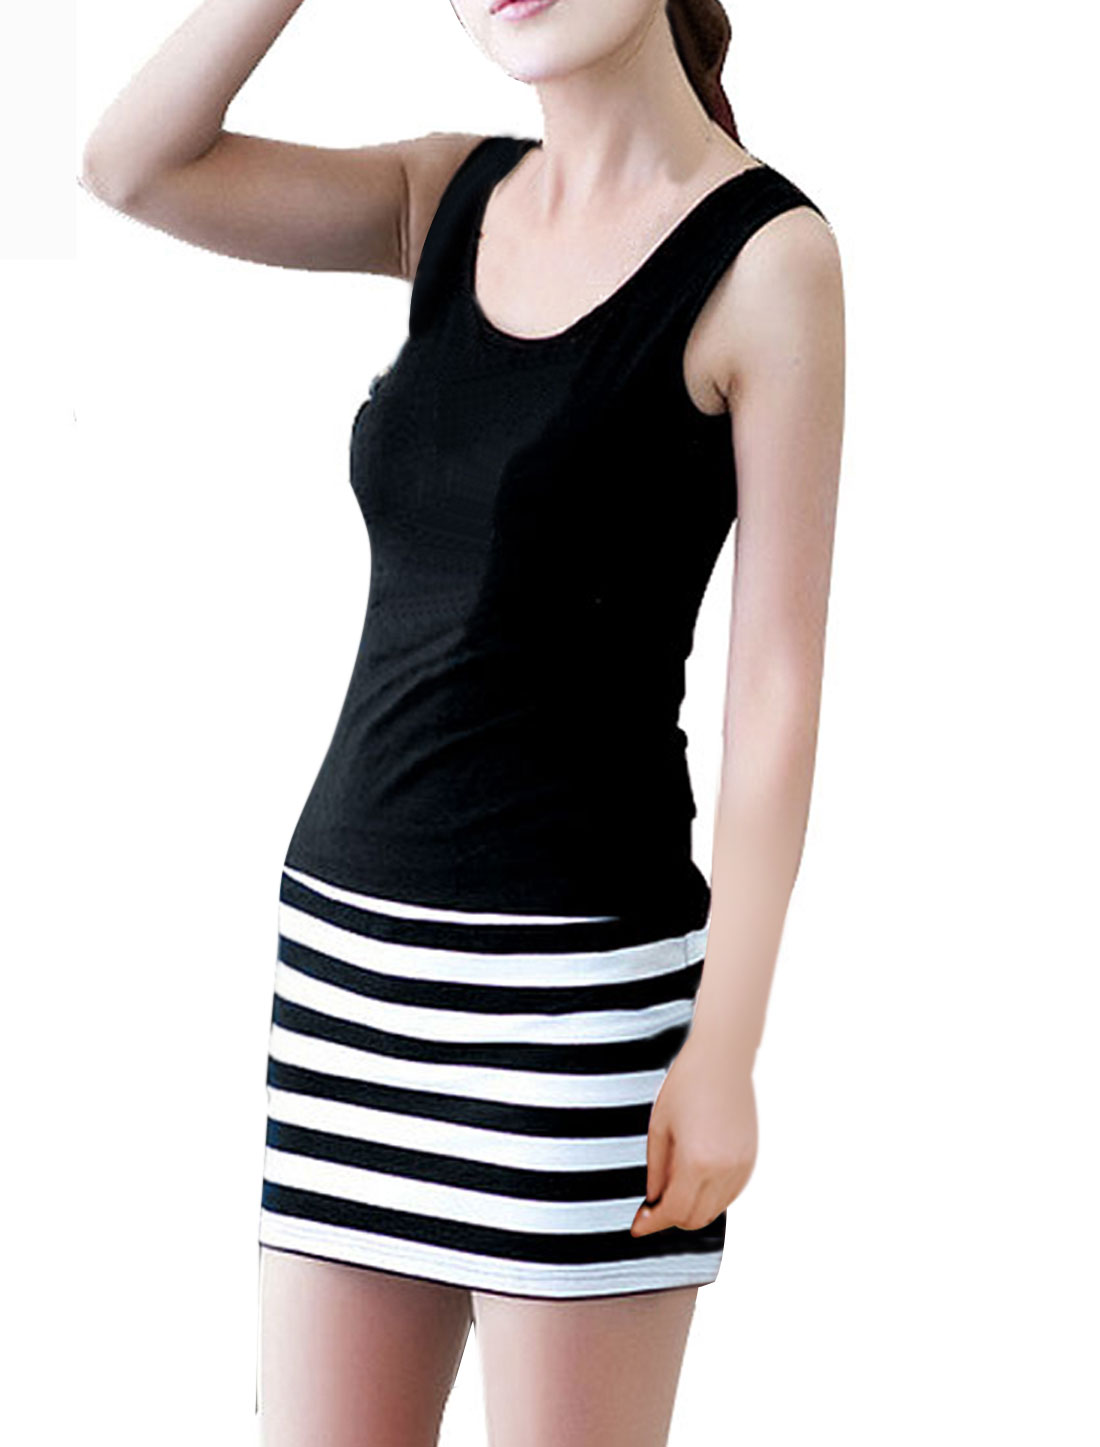 Women Sleeveless Tightfitting Mini Razerback Mini Dress Black White XS